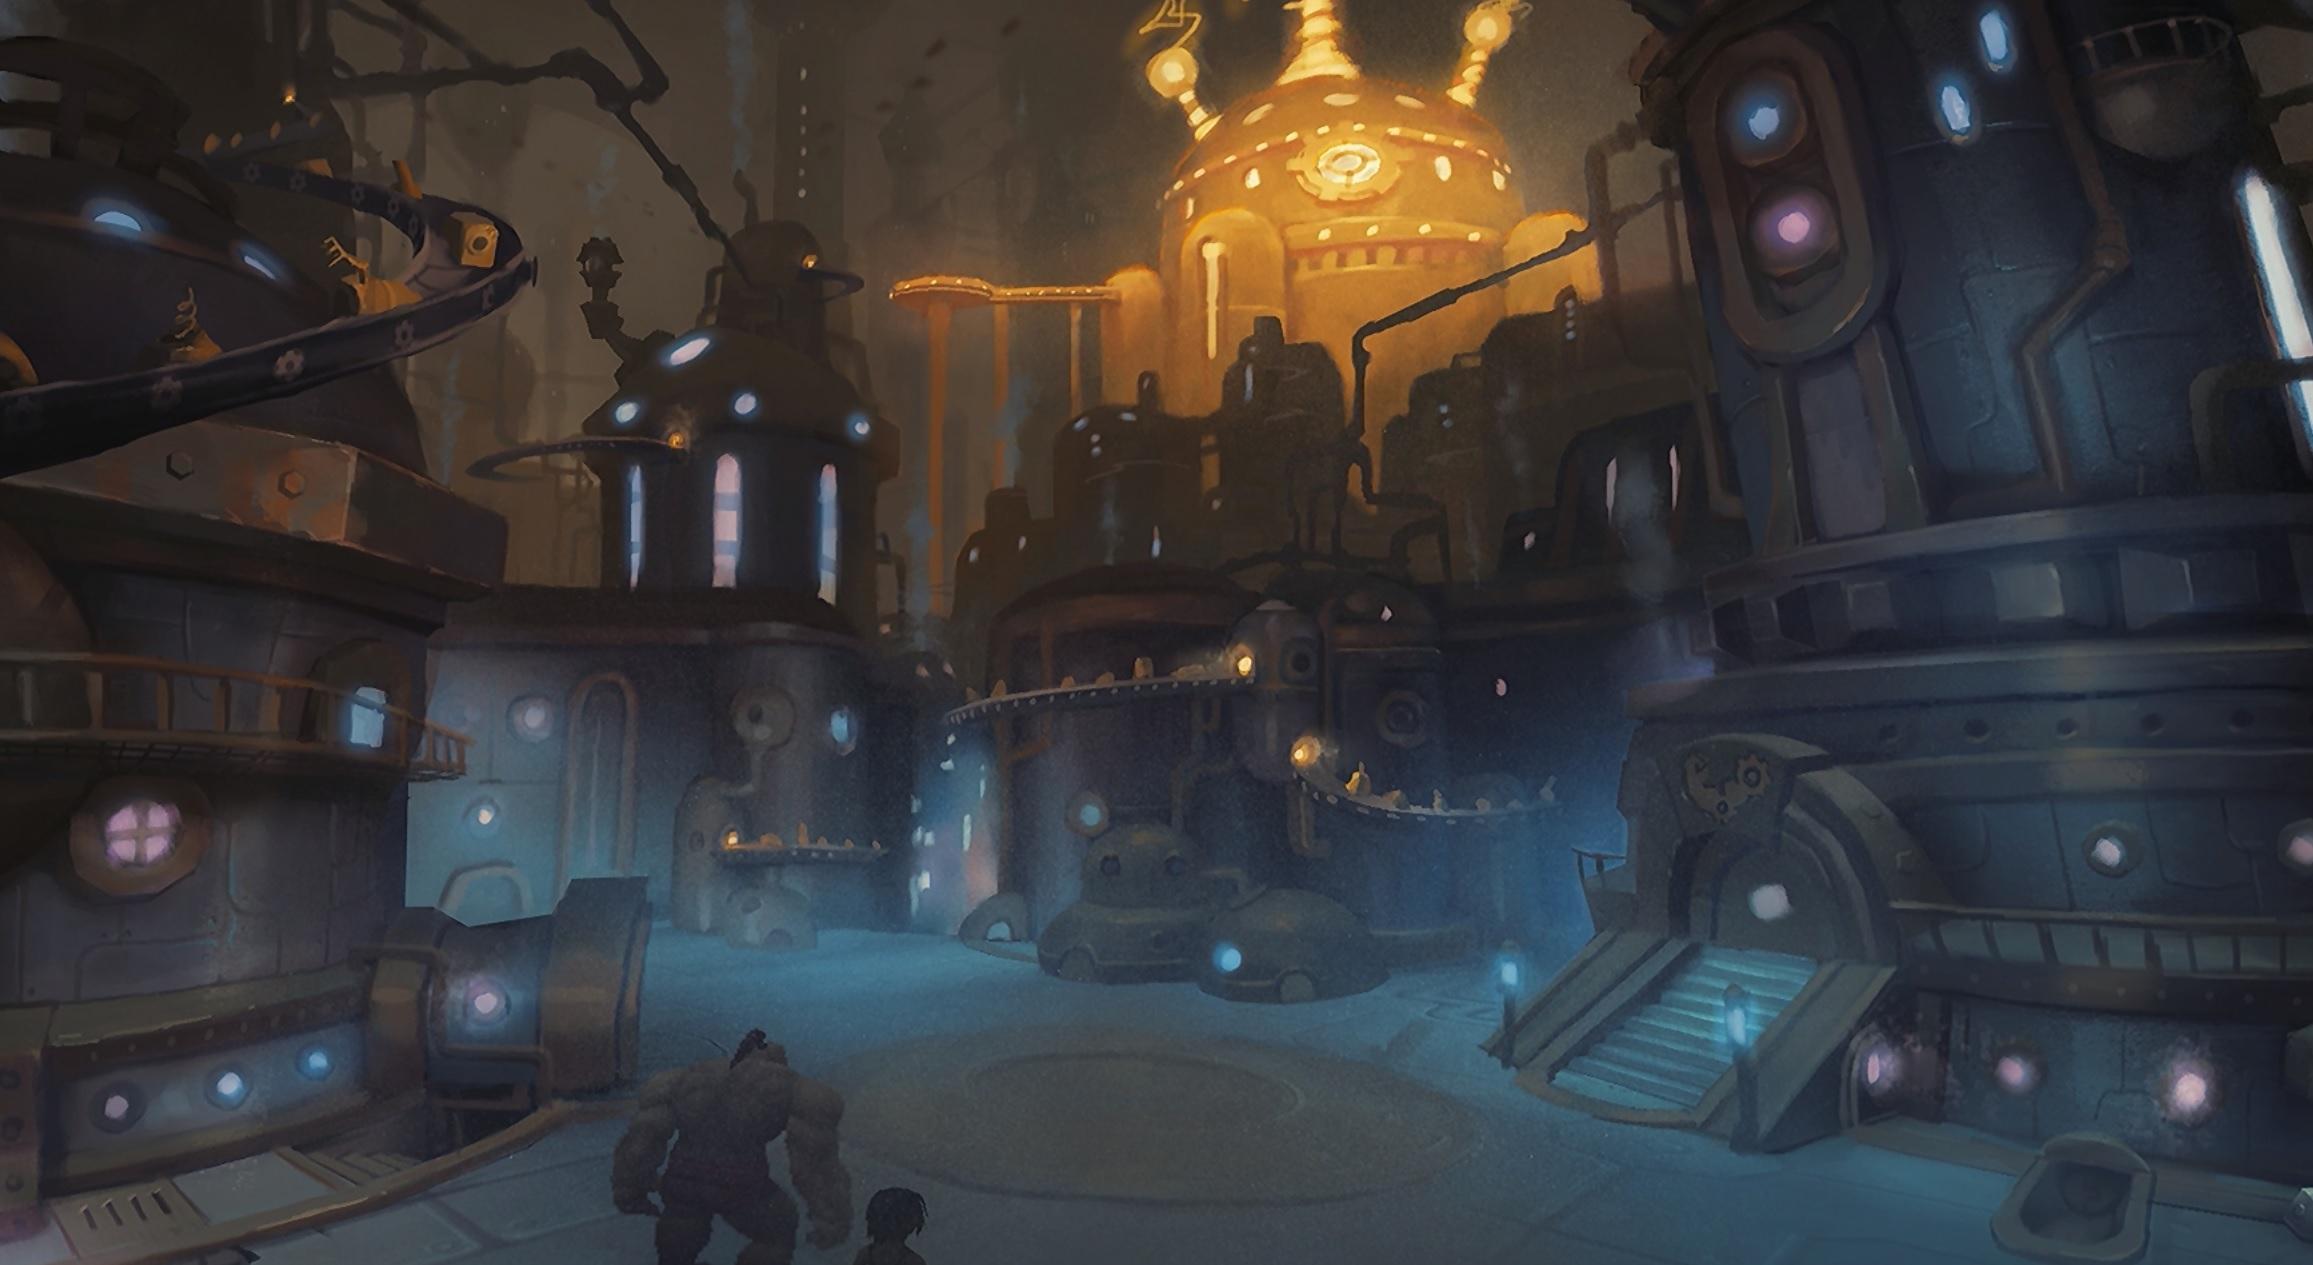 World of Warcraft 8.1 dated, next updates go to Nazjatar and Mechagon screenshot